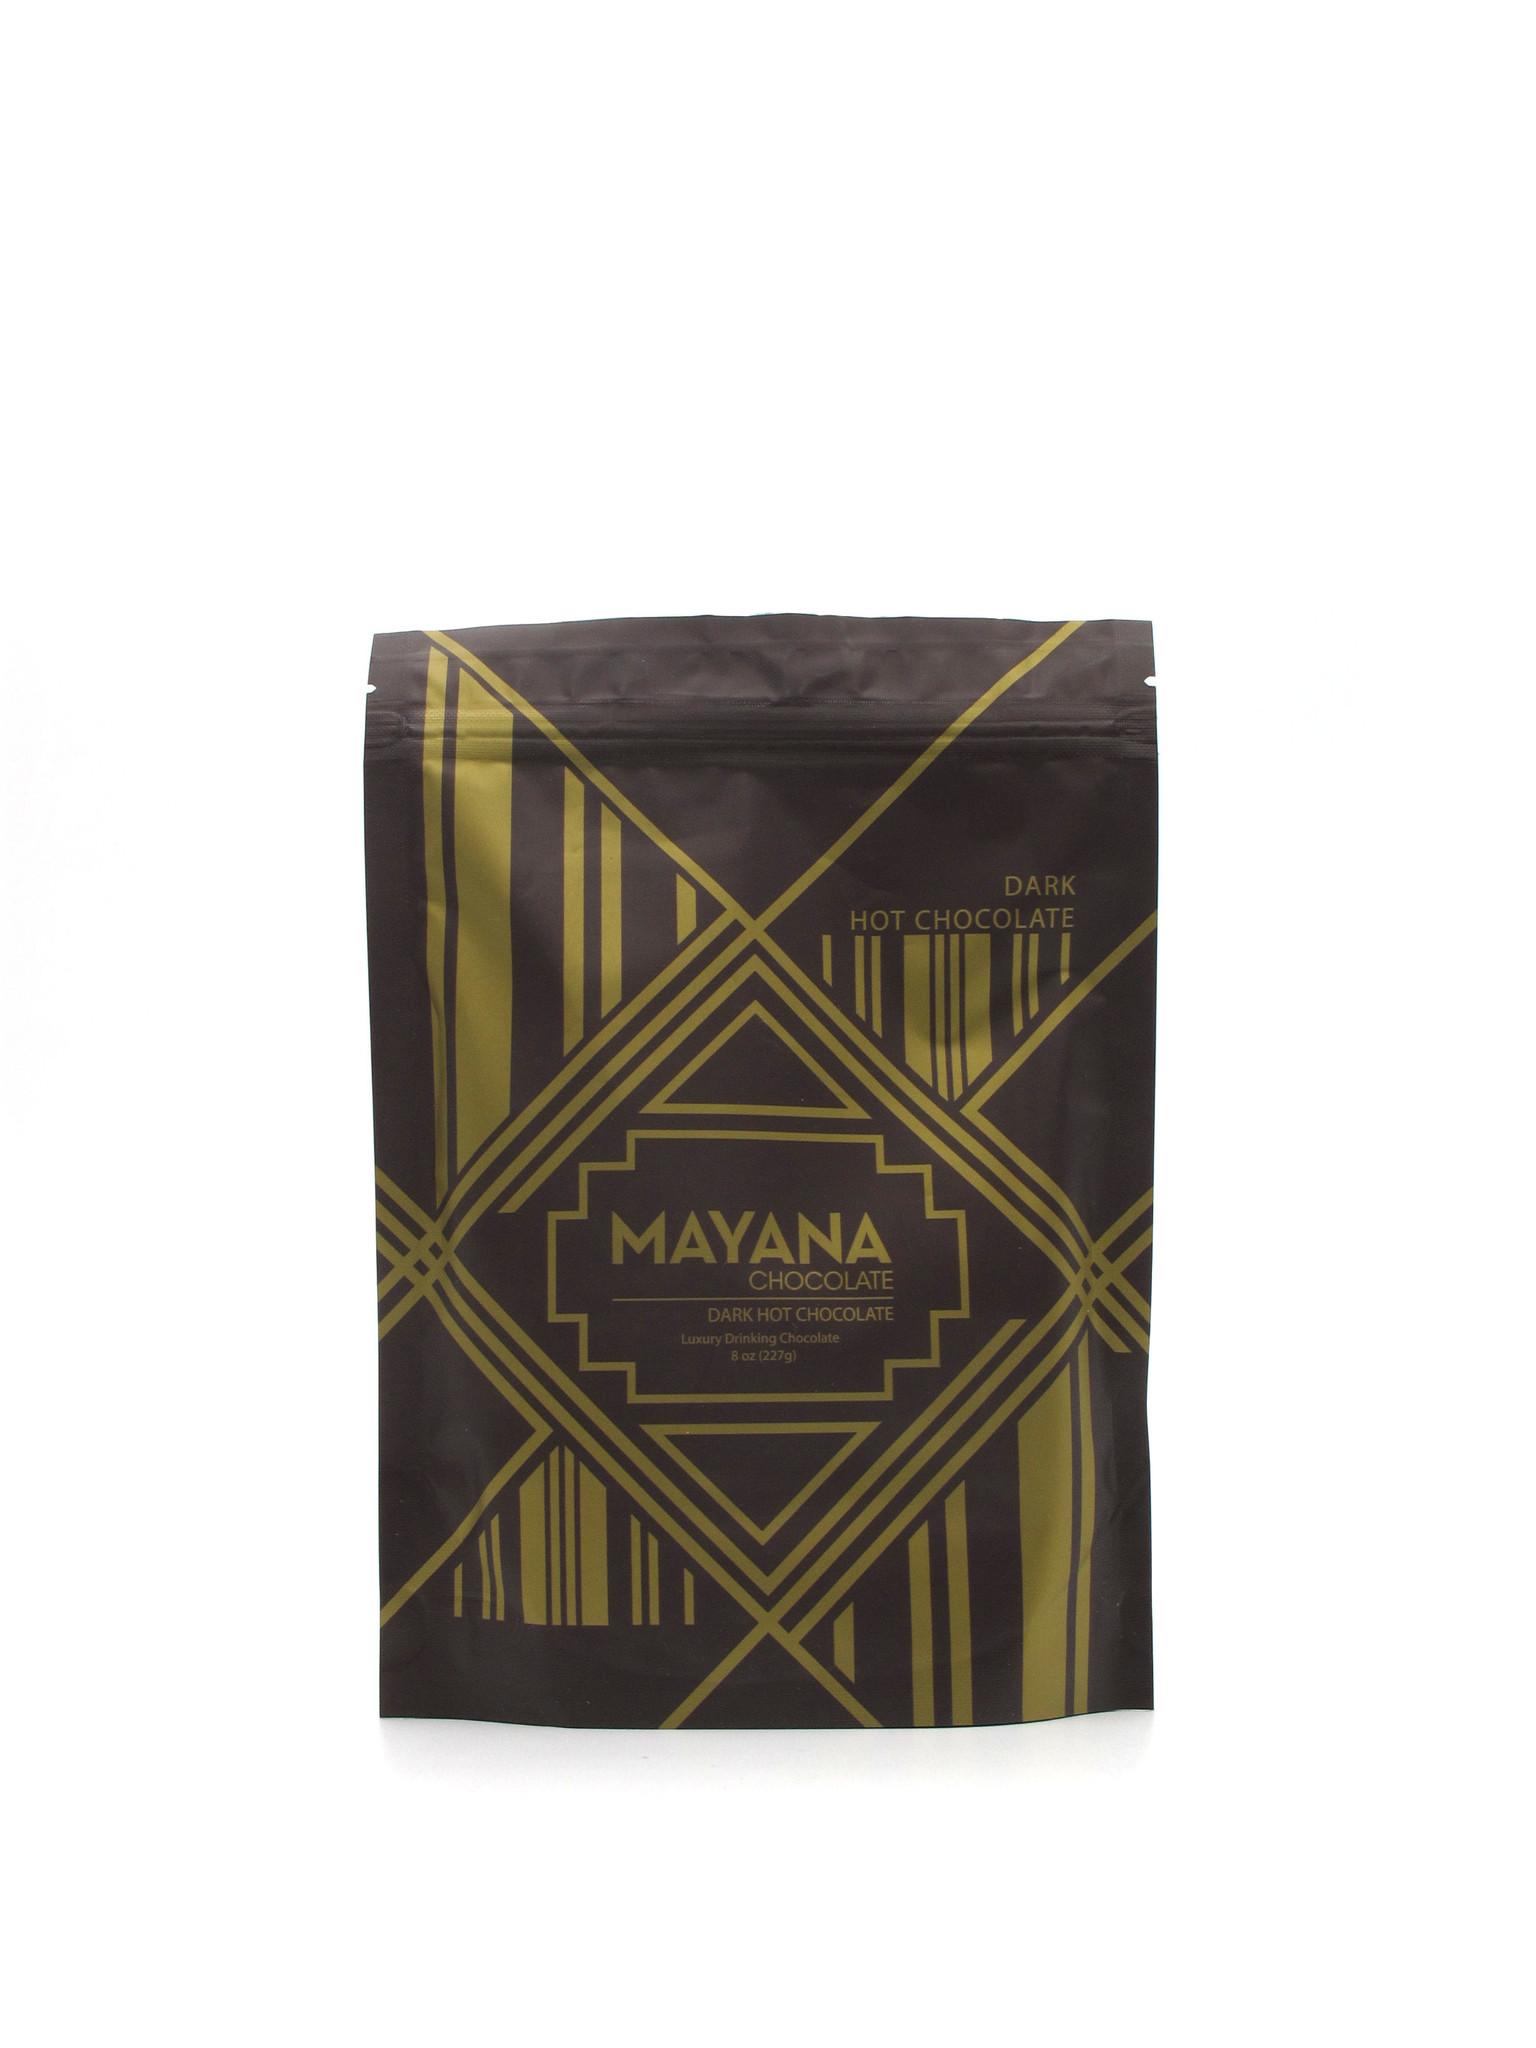 Mayana Chocolate Mayana Dark Hot Chocolate 8oz